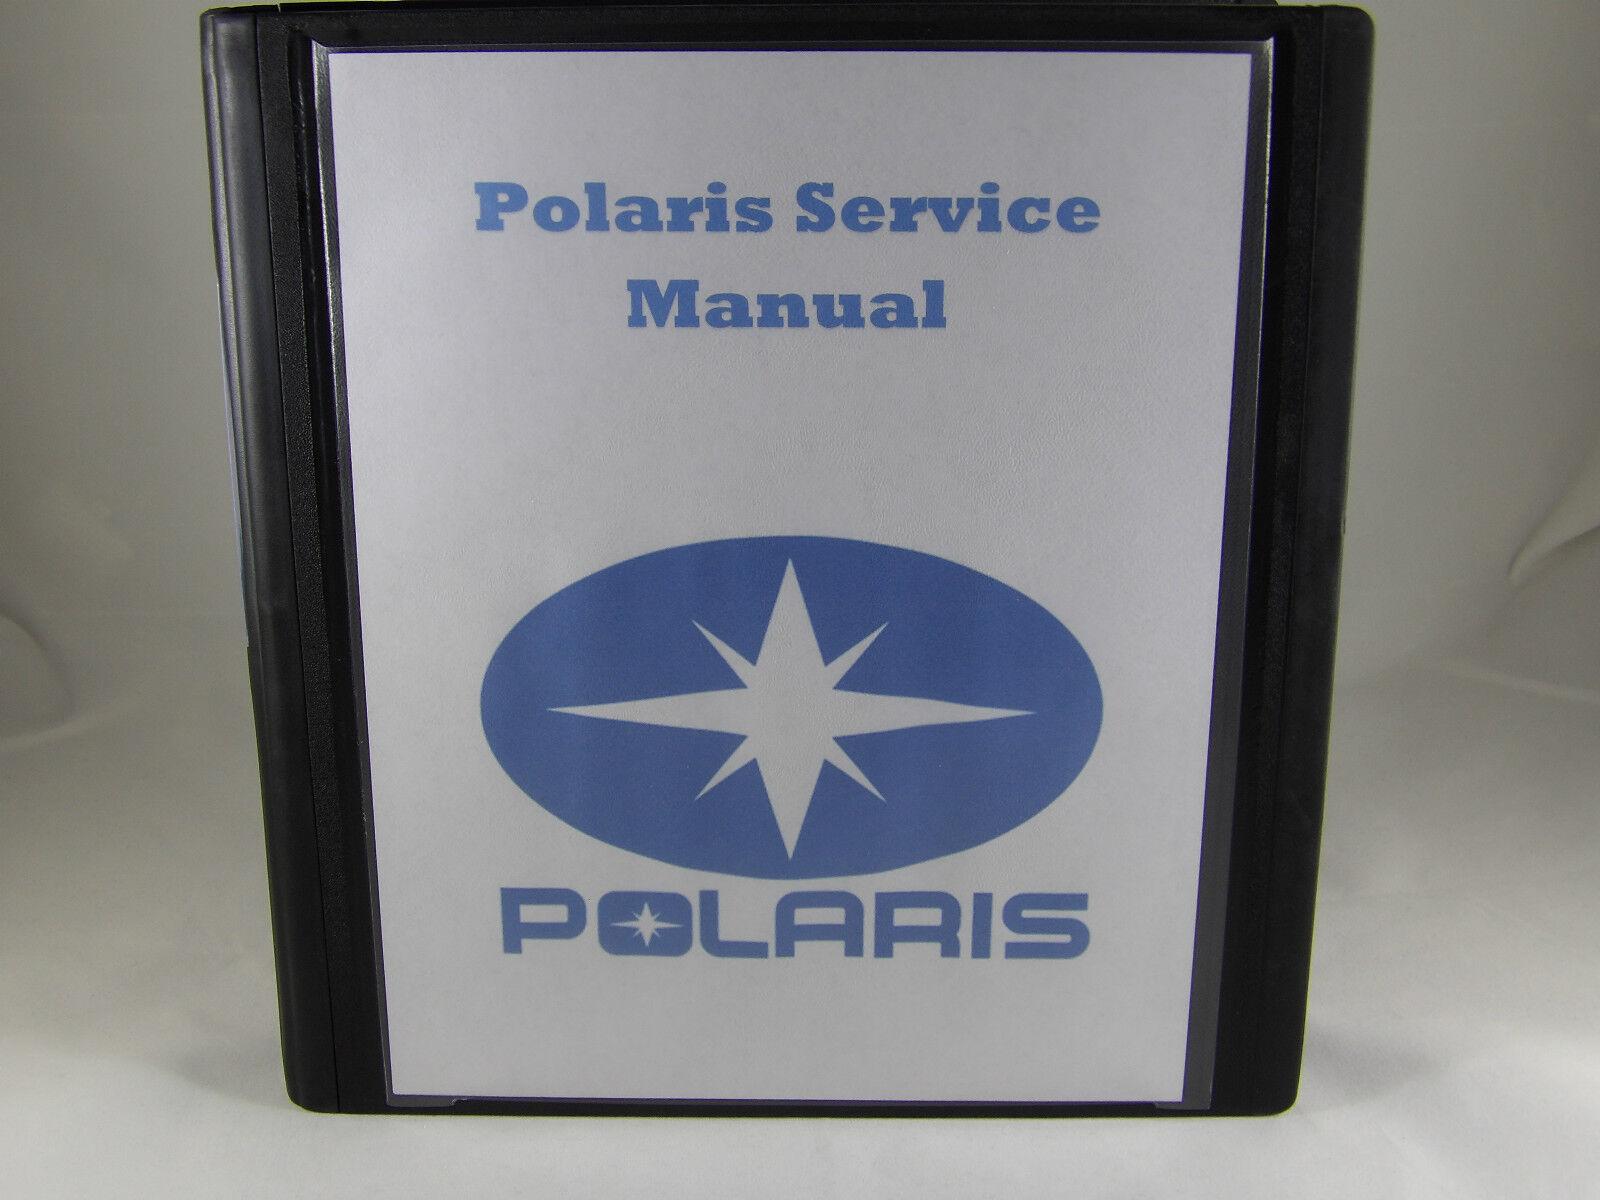 2009 polaris ranger 700 6x6 service manual ebay rh ebay com 2009 polaris ranger 700 crew service manual 2008 polaris ranger service manual